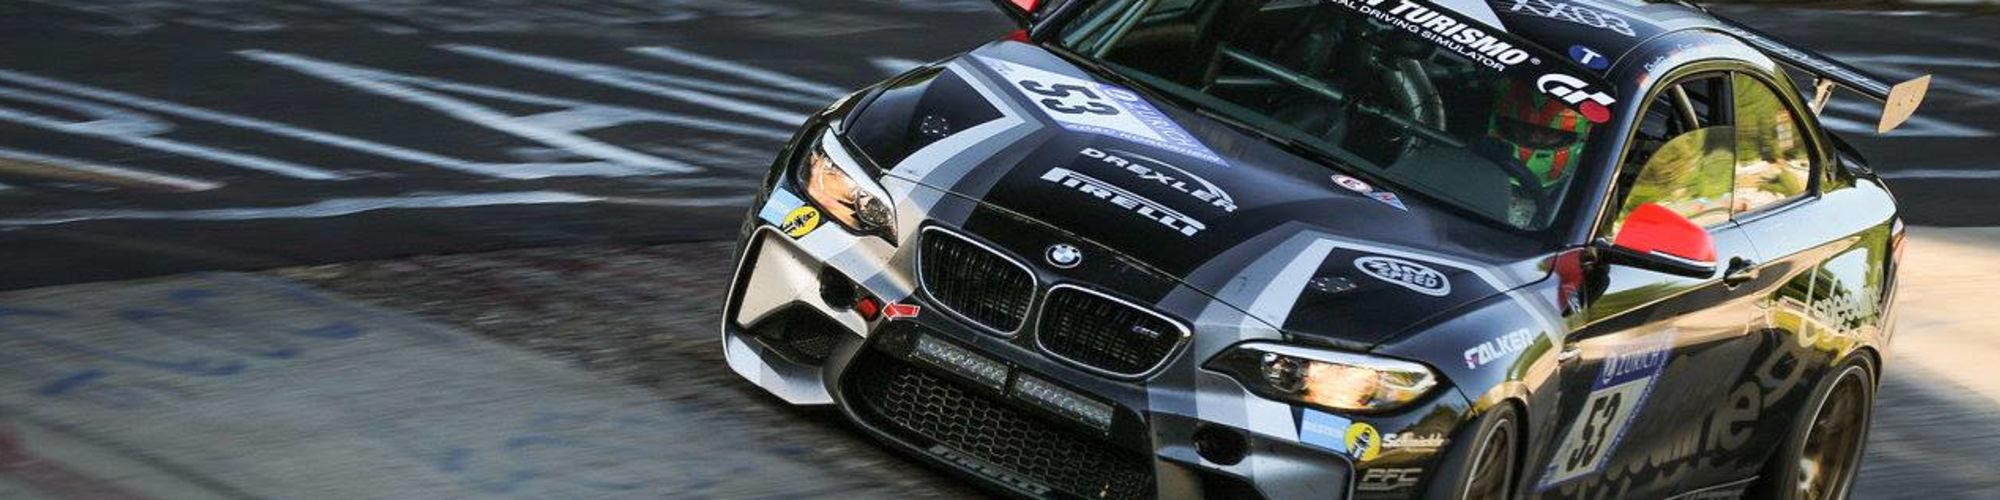 Nitron Racing Systems Ltd.